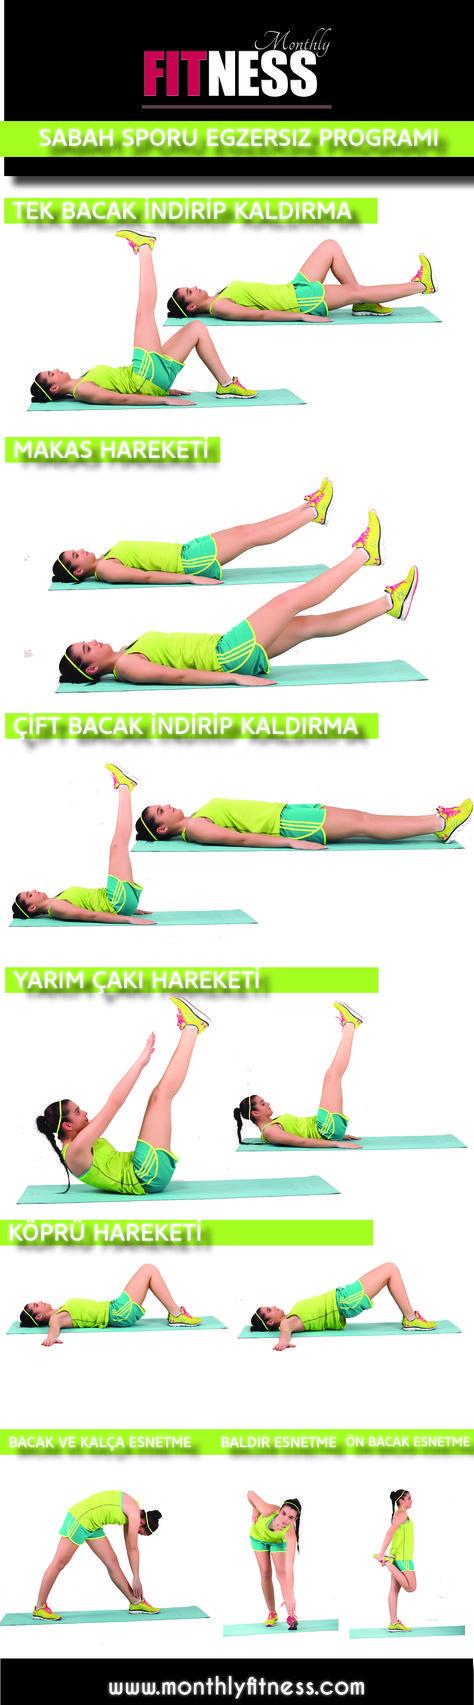 SABAH SPORU EGZERSİZ PROGRAMI - Monthly Fitness